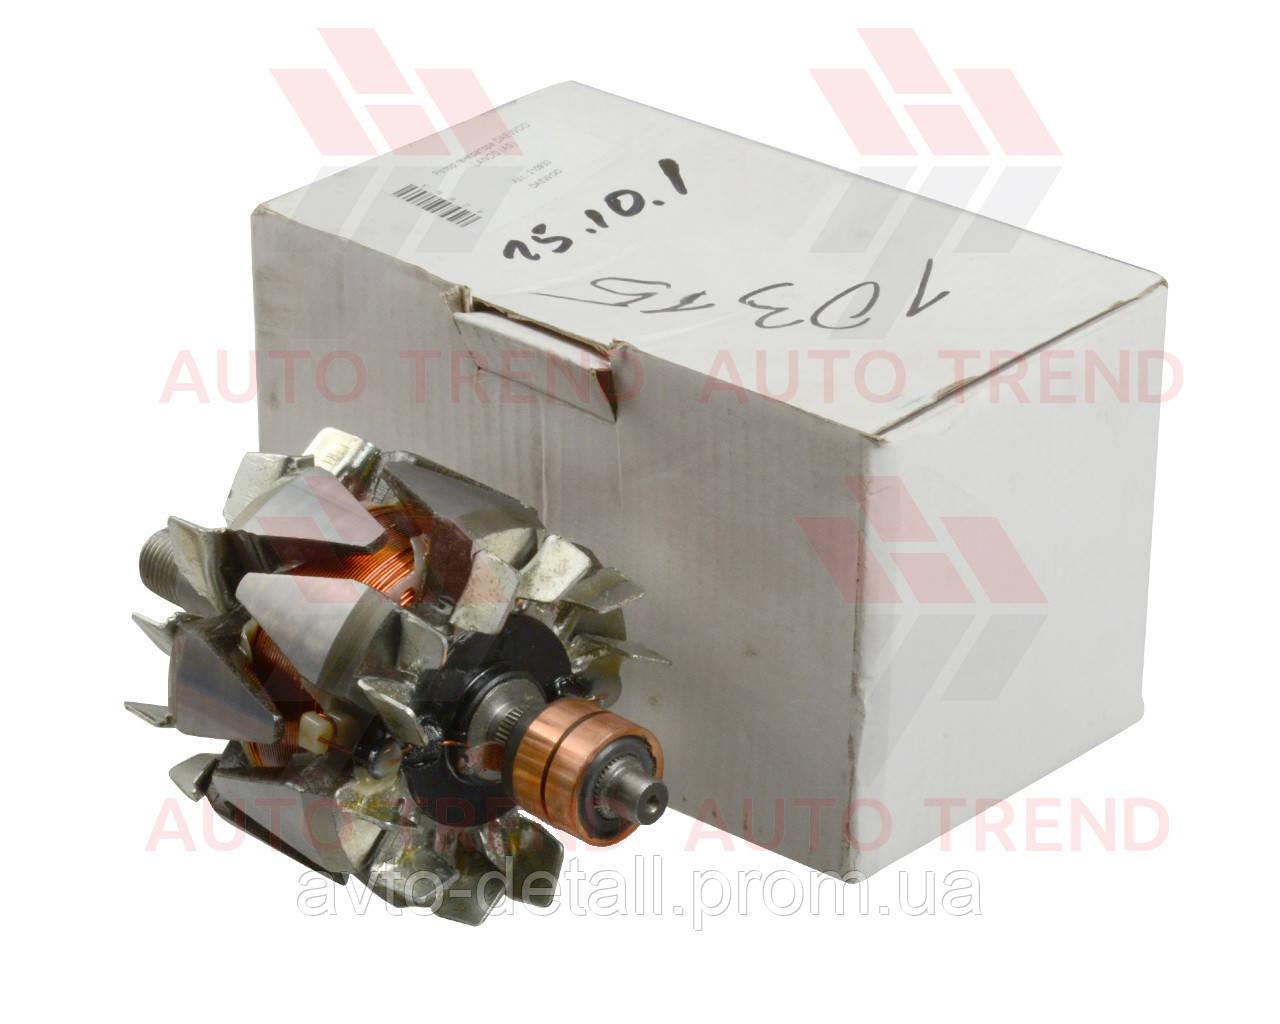 Якорь генератора (AS) Ланос 210933